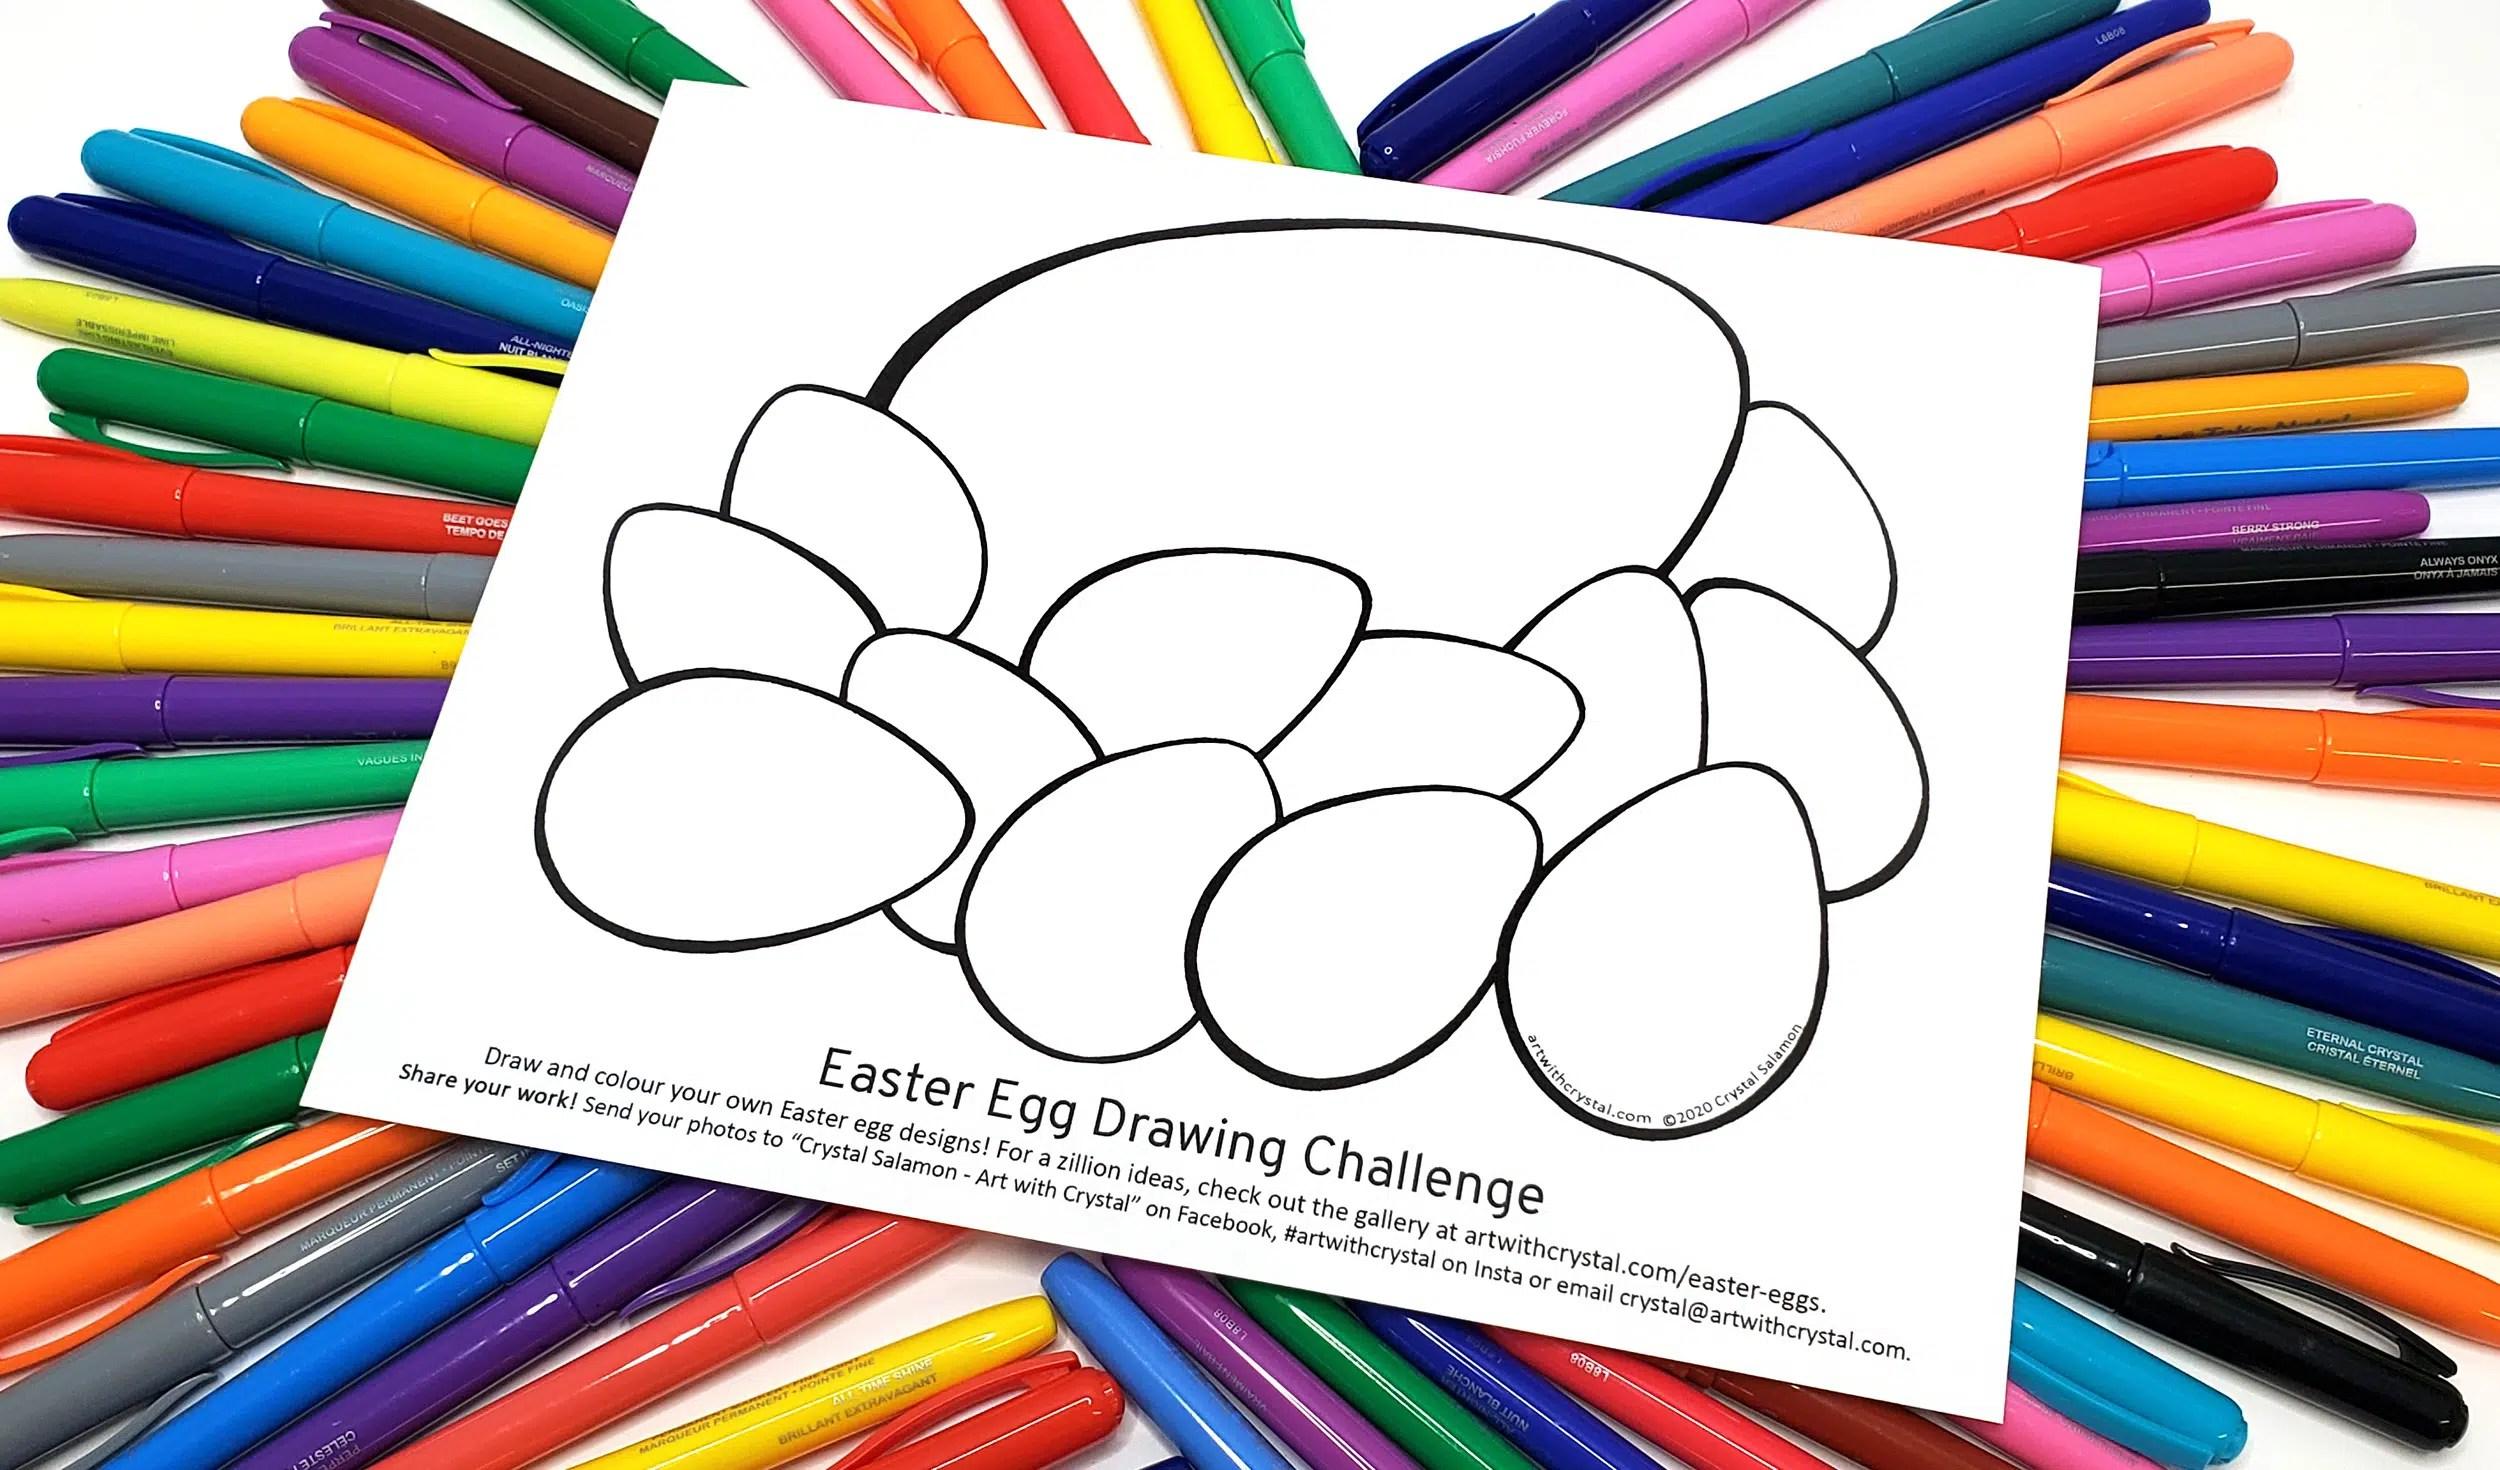 Easter Egg Drawing Challenge Free Printable Art With Crystal